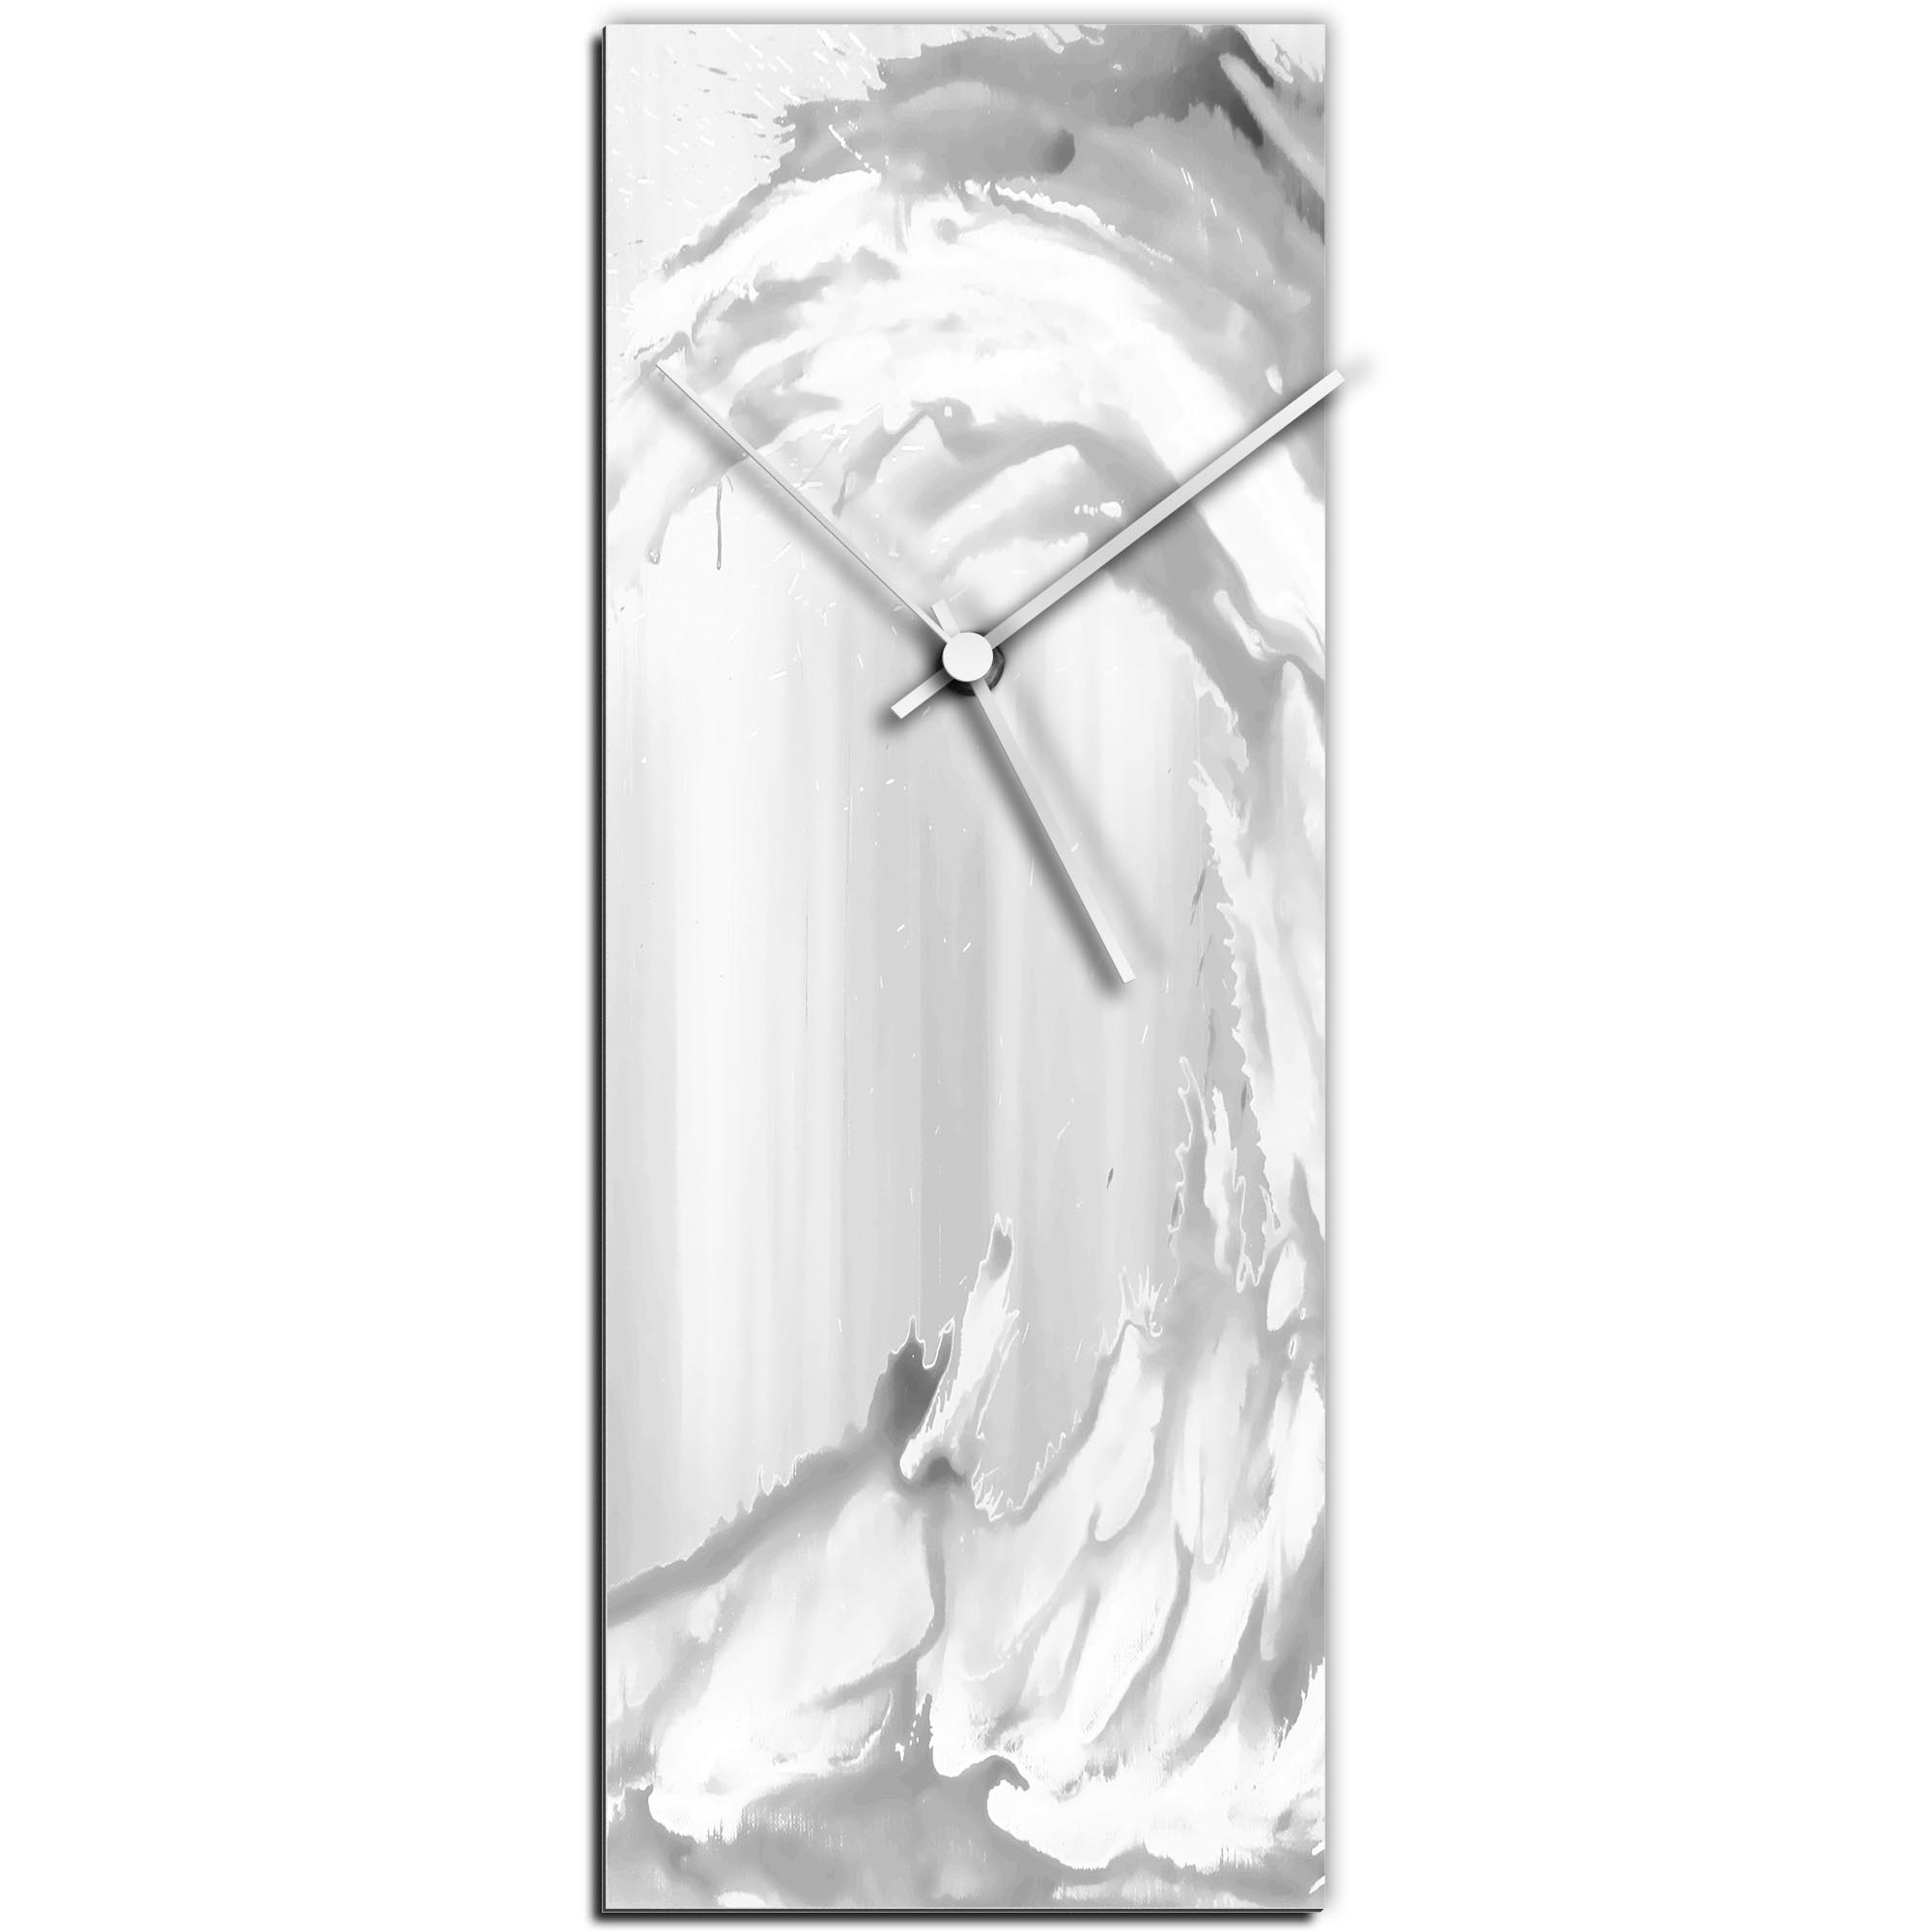 Mendo Vasilevski 'White Wave v2 Clock Large' 9in x 24in Modern Wall Clock on Aluminum Composite